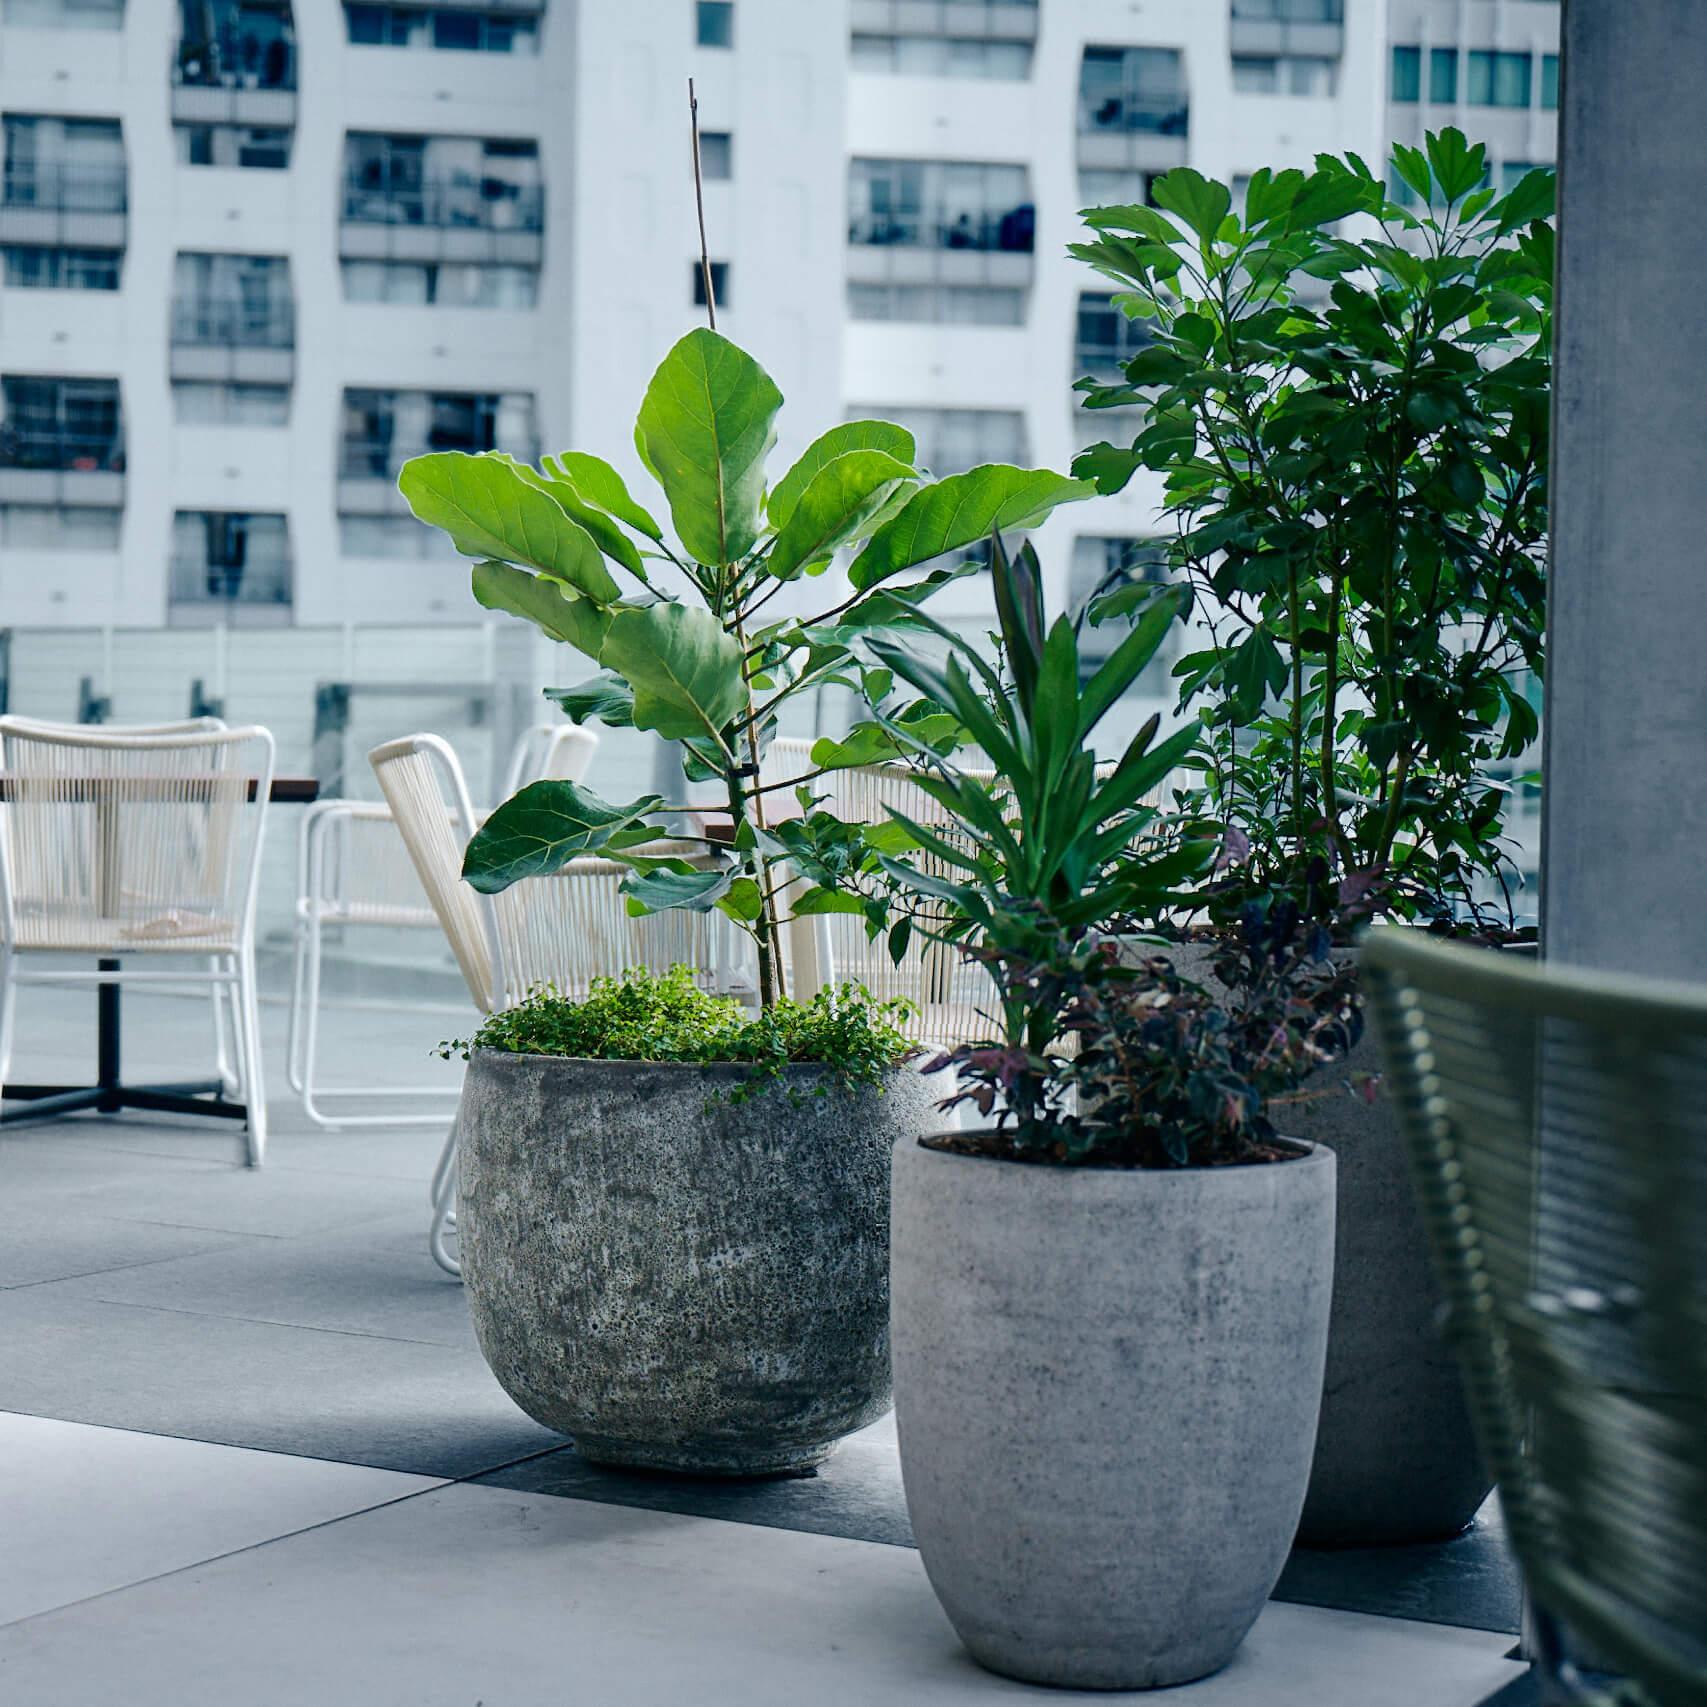 portfolio-offices-spaces-lumley-image6